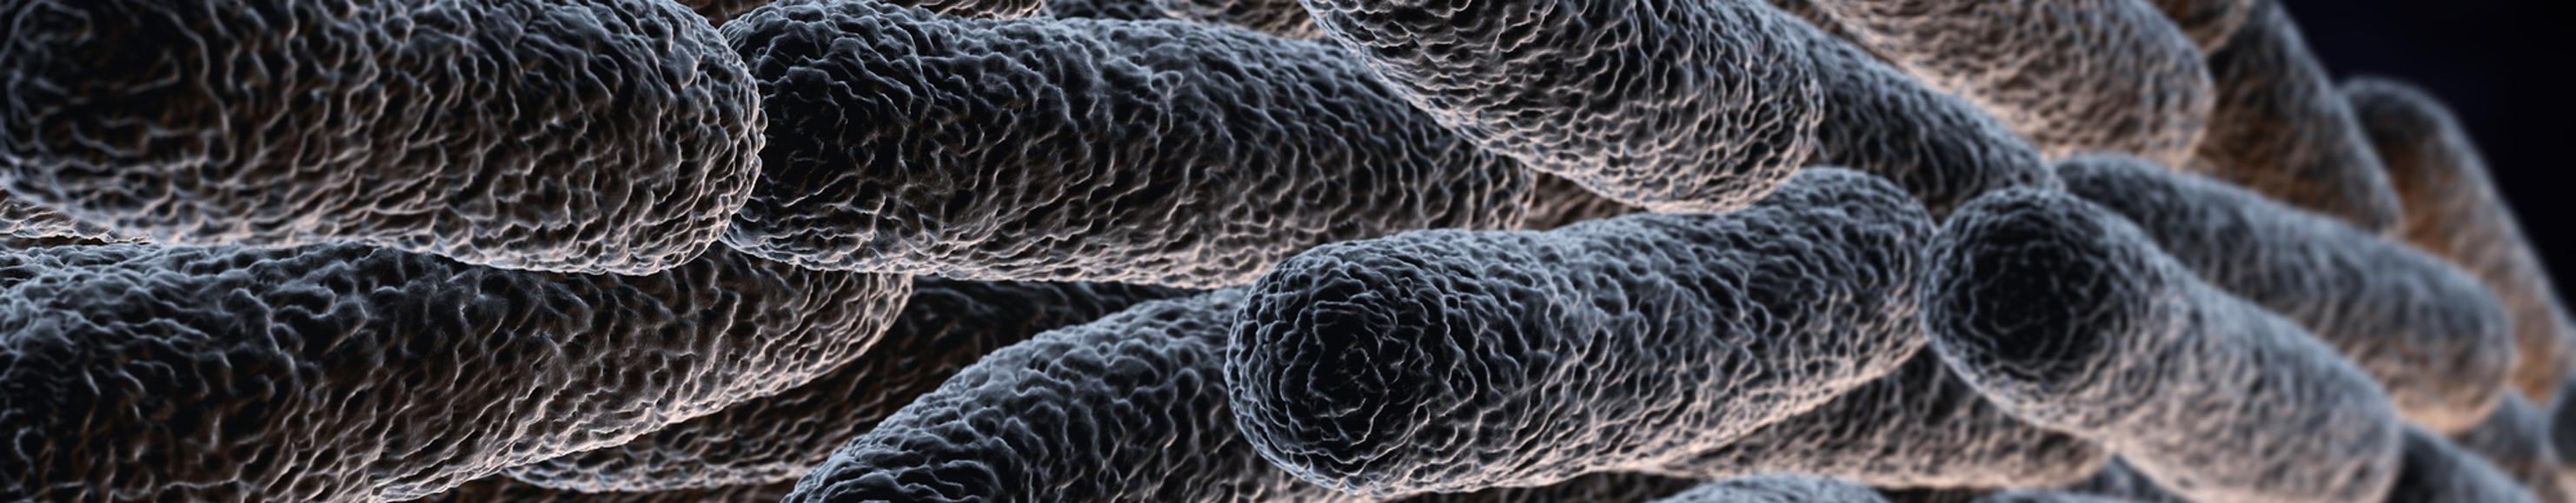 Biocide Sensitivity Analysis